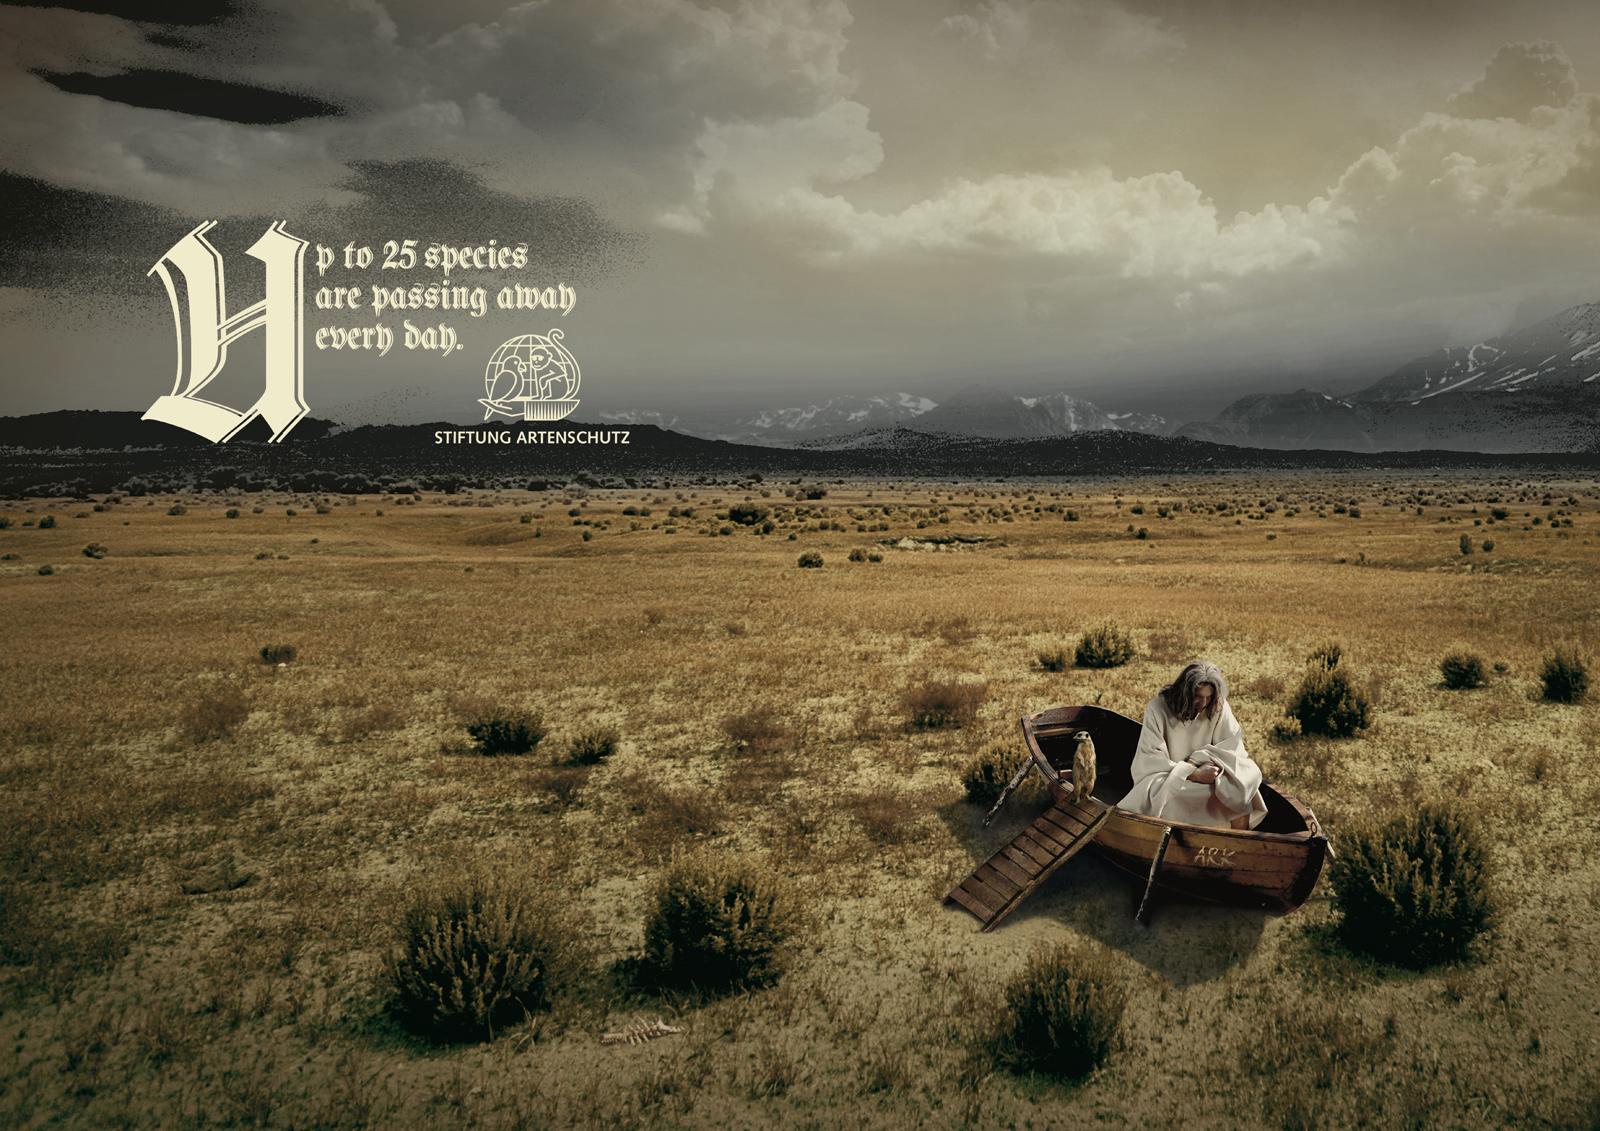 Stiftung Artenschutz Outdoor Ad -  Ark